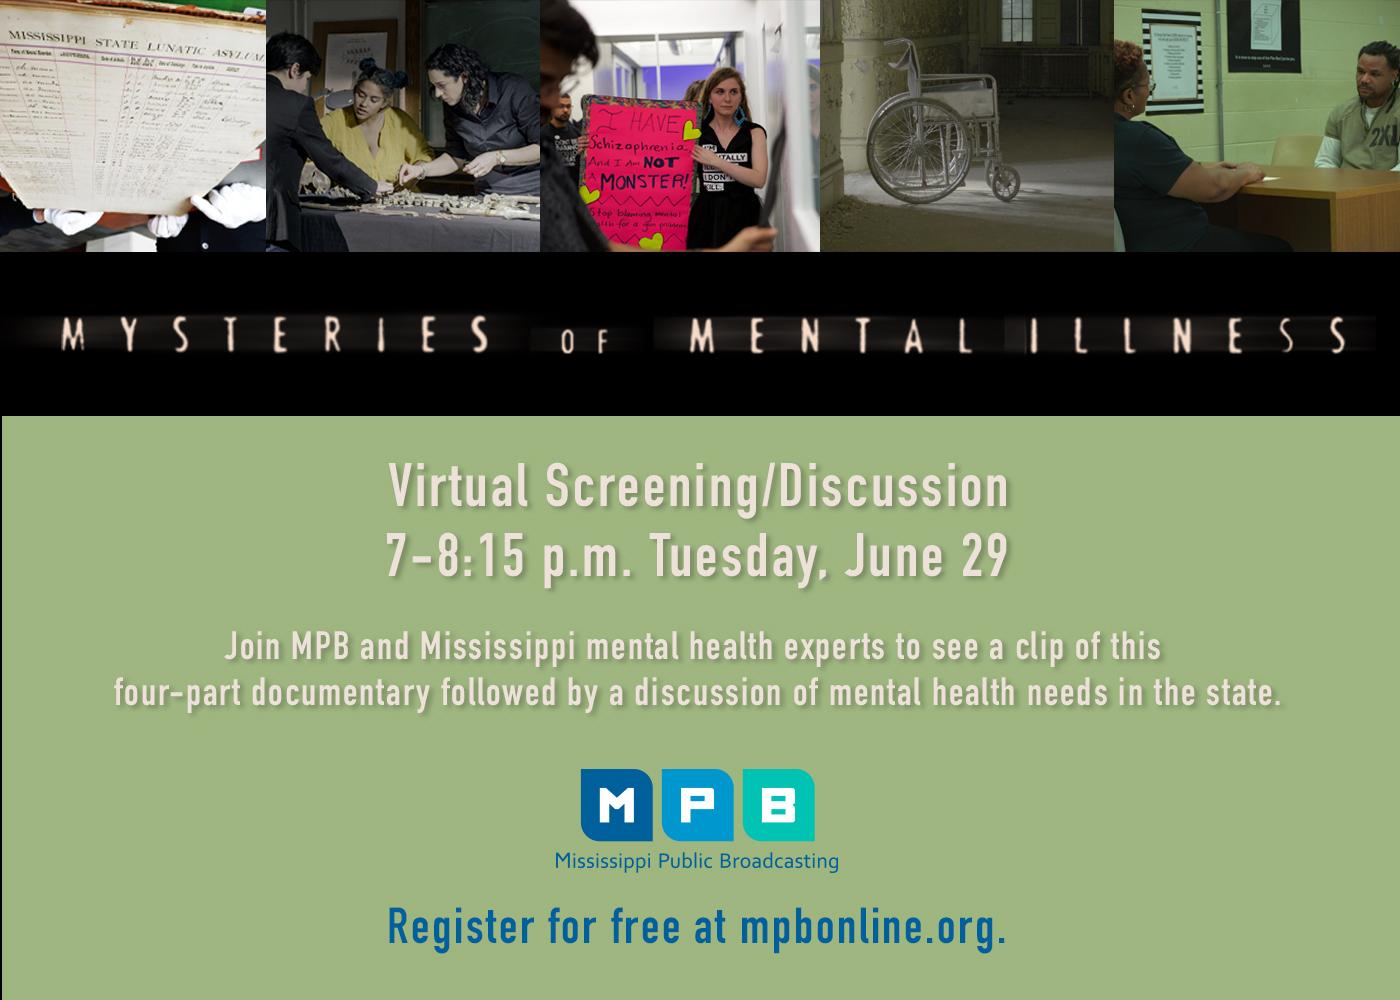 MPB's Mysteries of Mental Illness event flyer